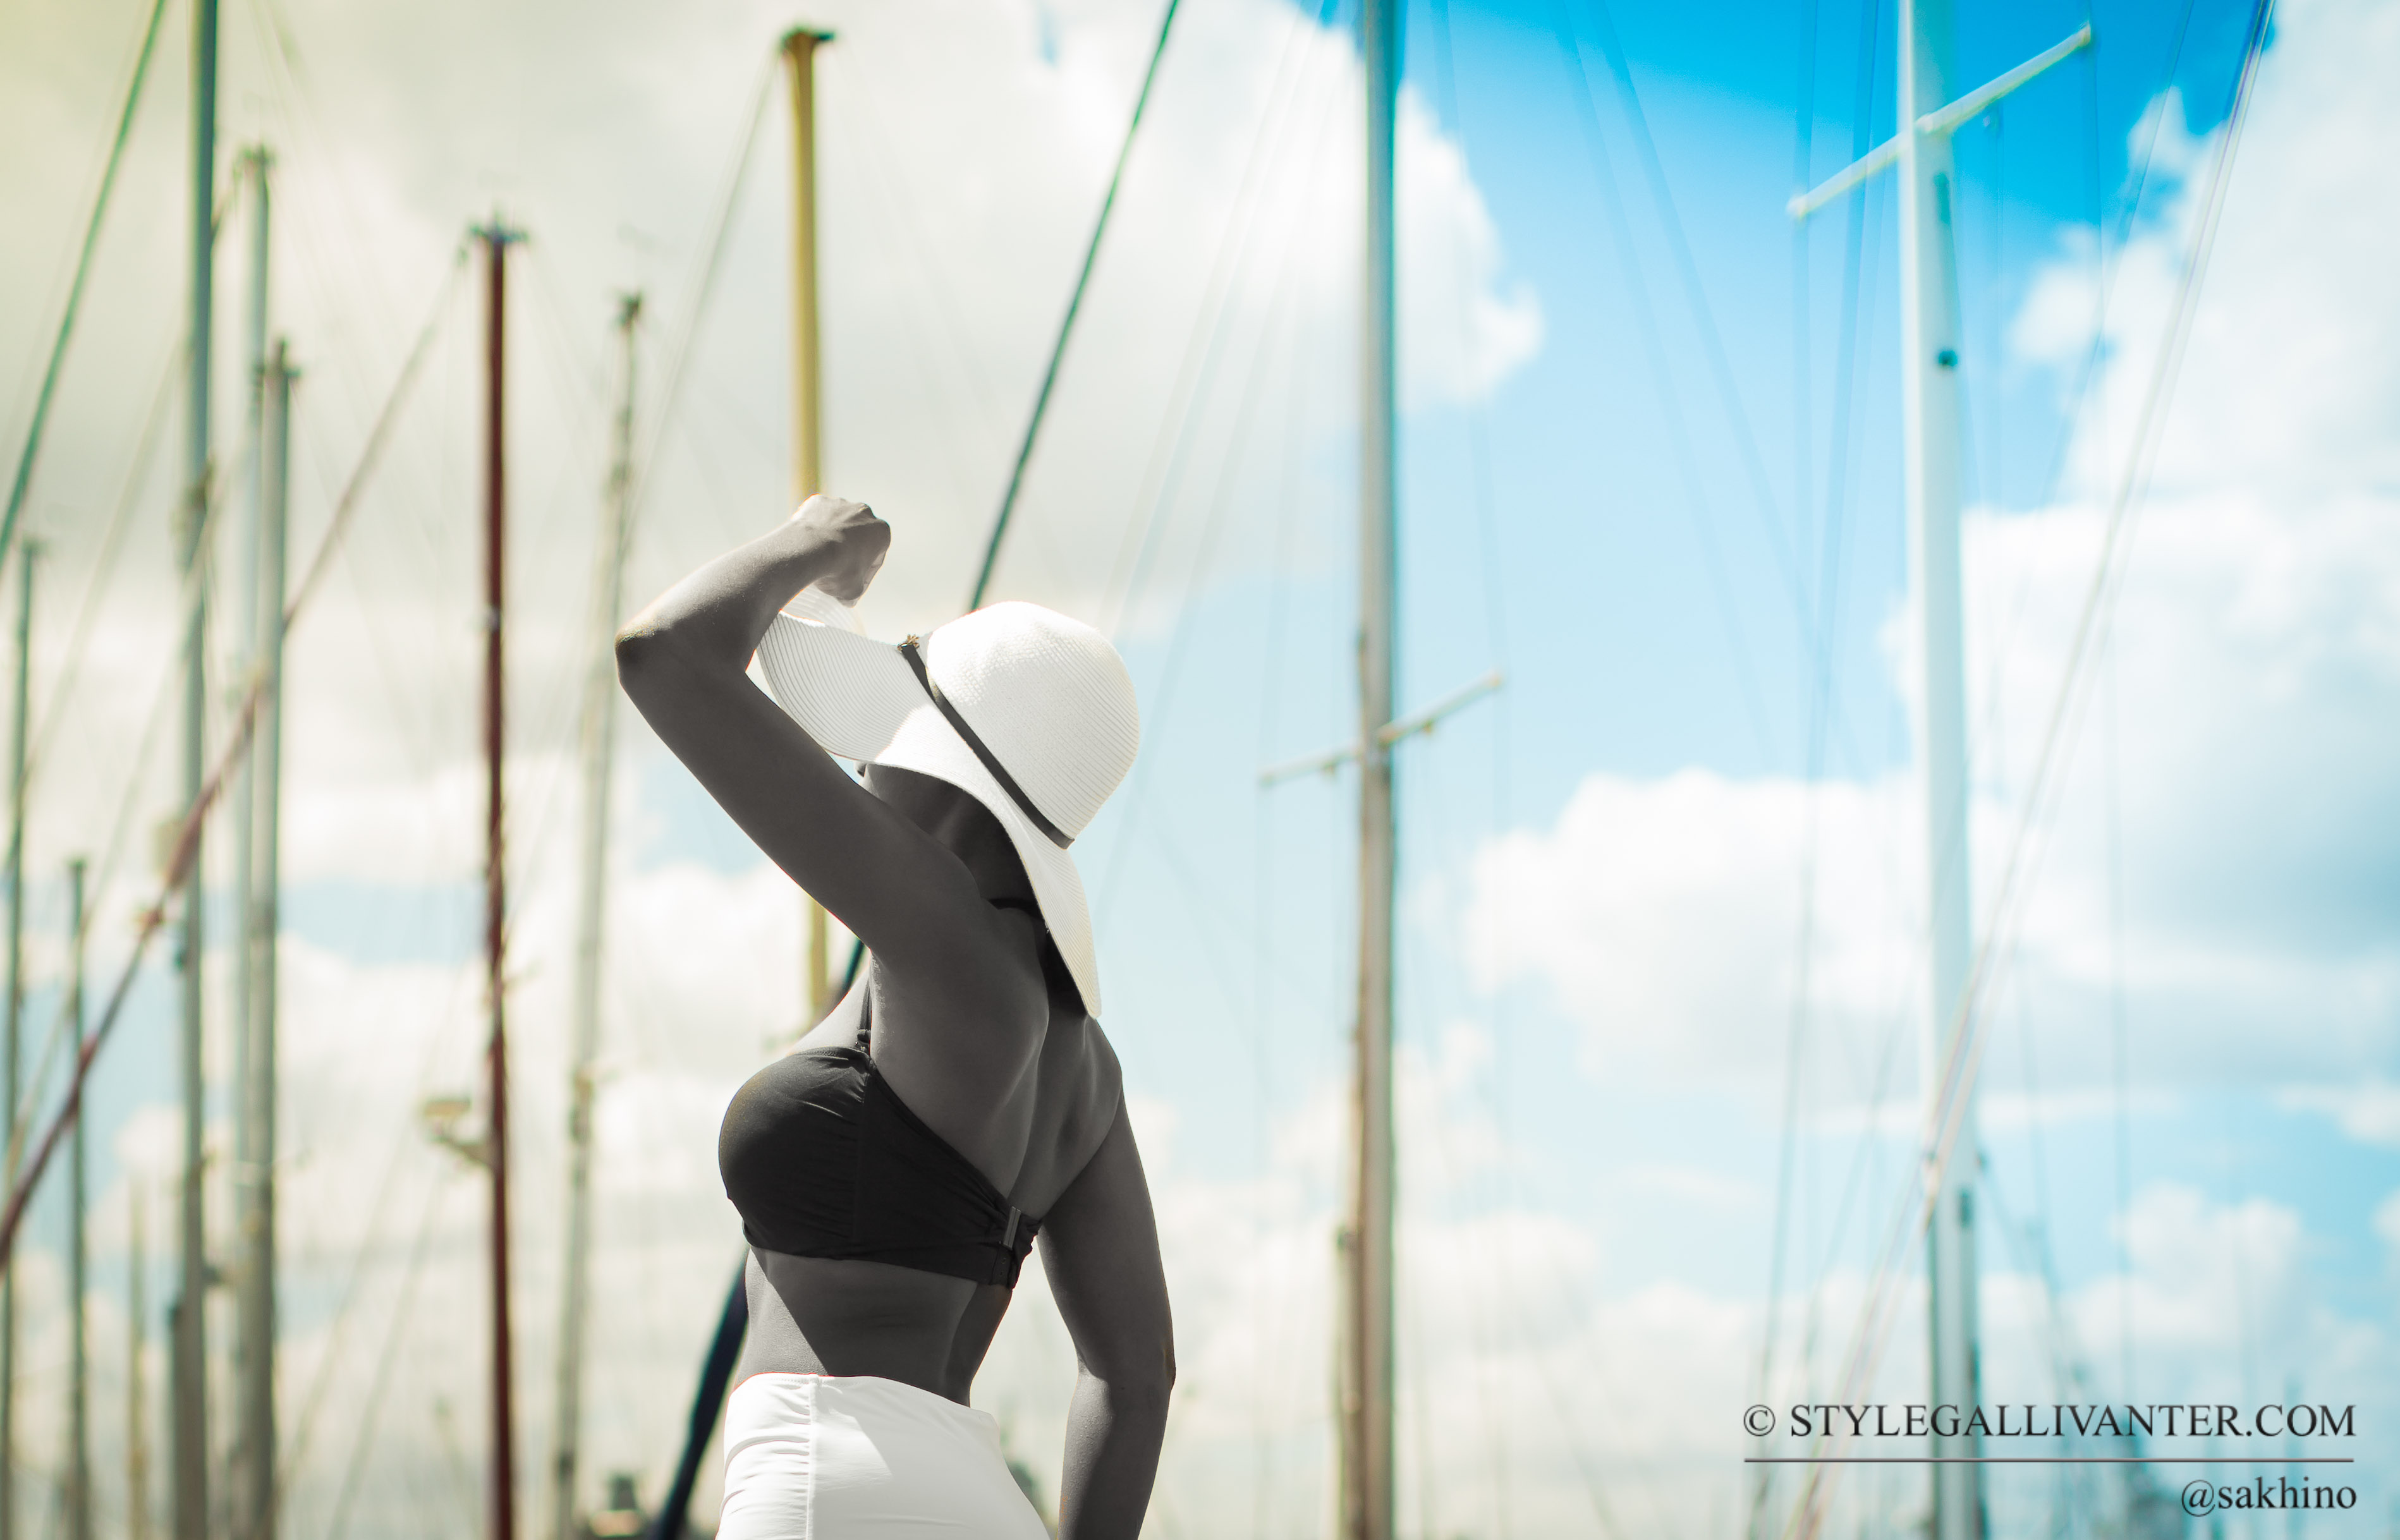 swimwear-trends-2015_top-models-melbourne_best-african-black-models-melbourne-australia_fashfest-models_surania_topfashion-blogs-africa-2